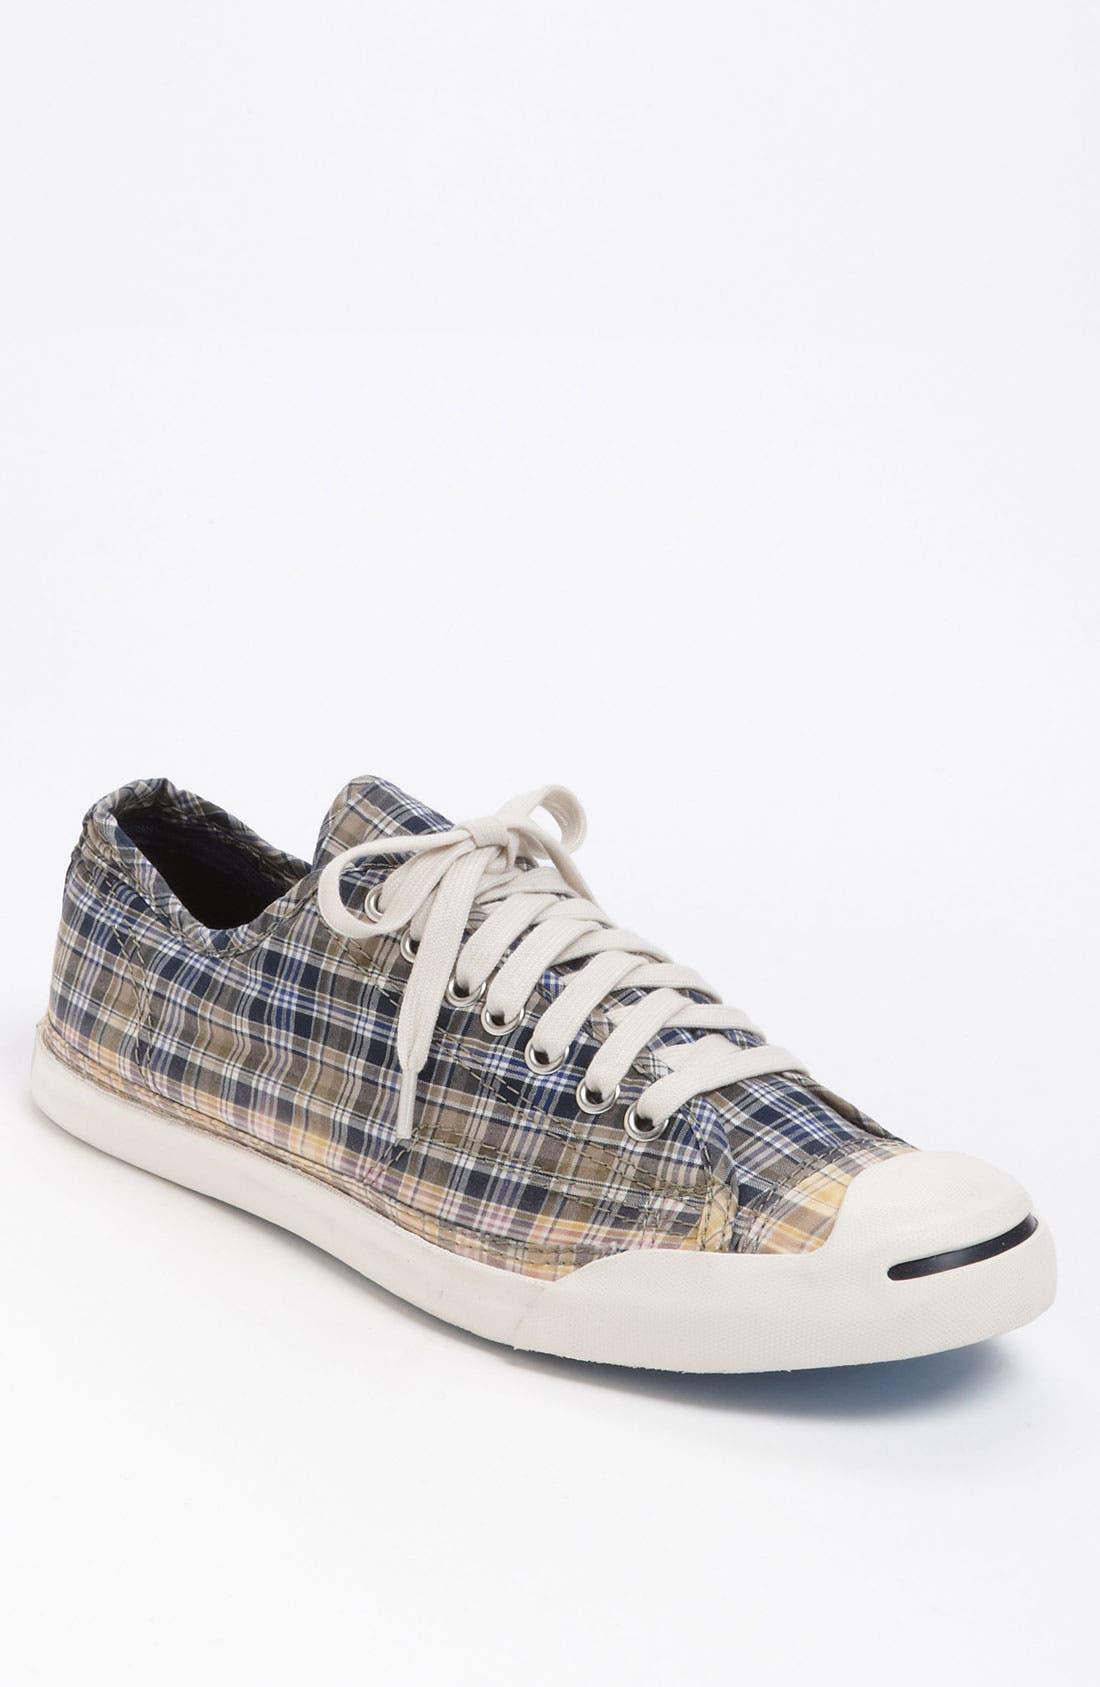 Main Image - Converse 'Jack Purcell' Sneaker (Men)